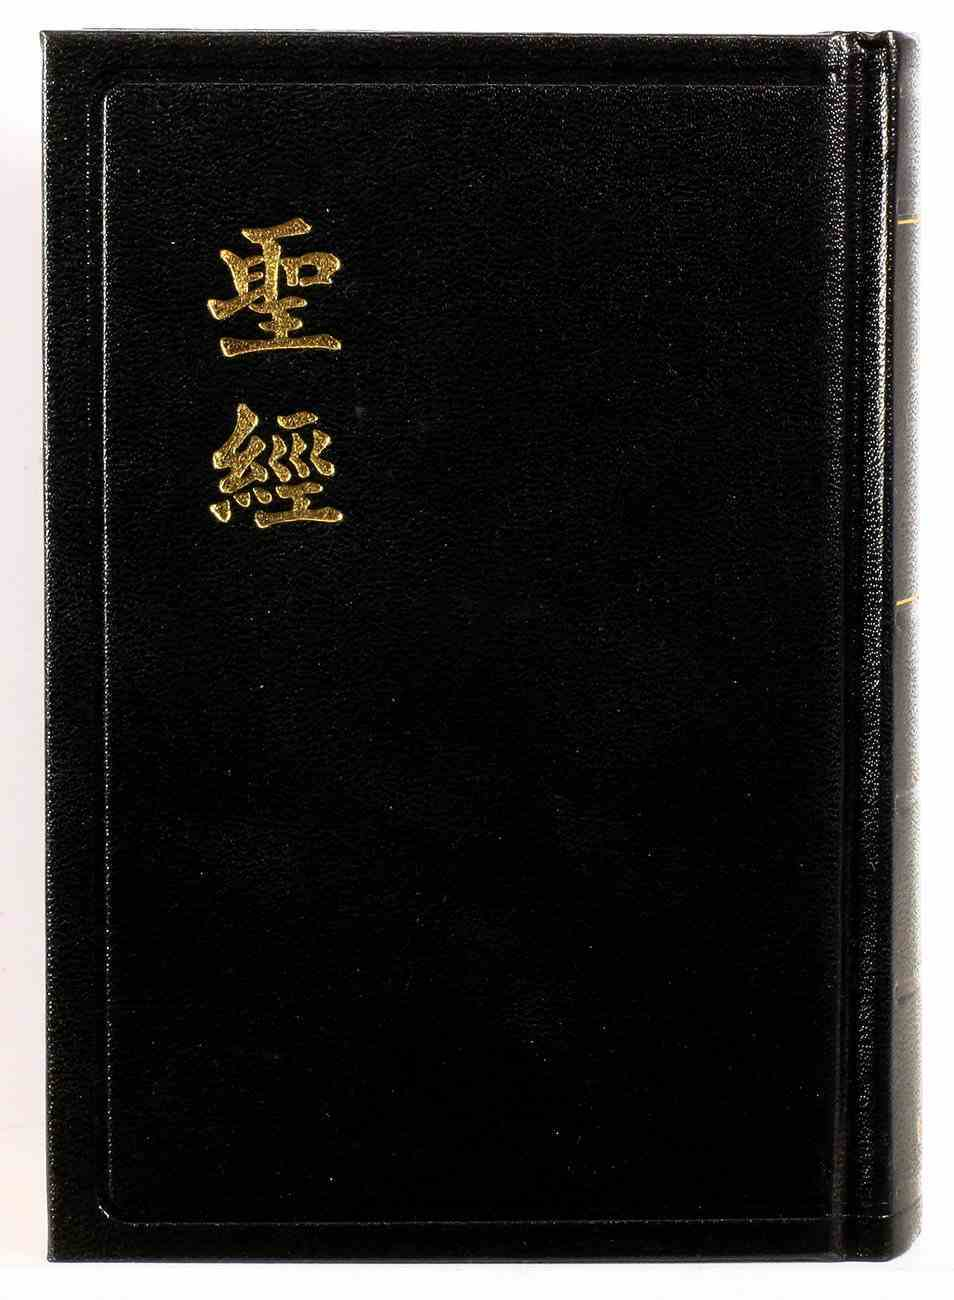 CUV Chinese Union Version Shen Edition Traditional Black Hardback